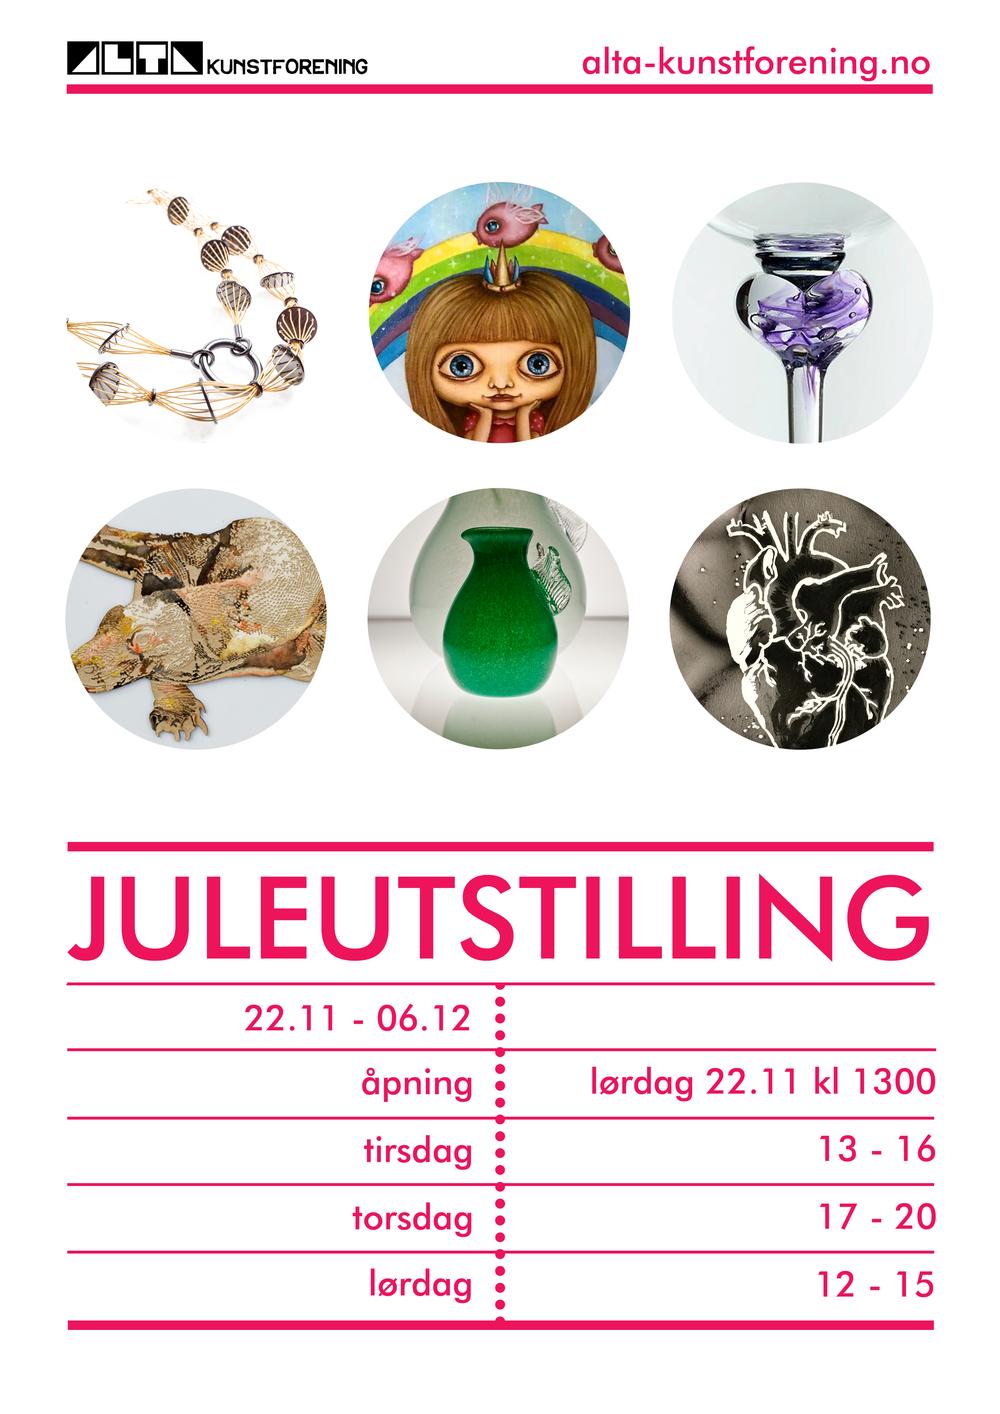 juleutstilling2014web.jpg